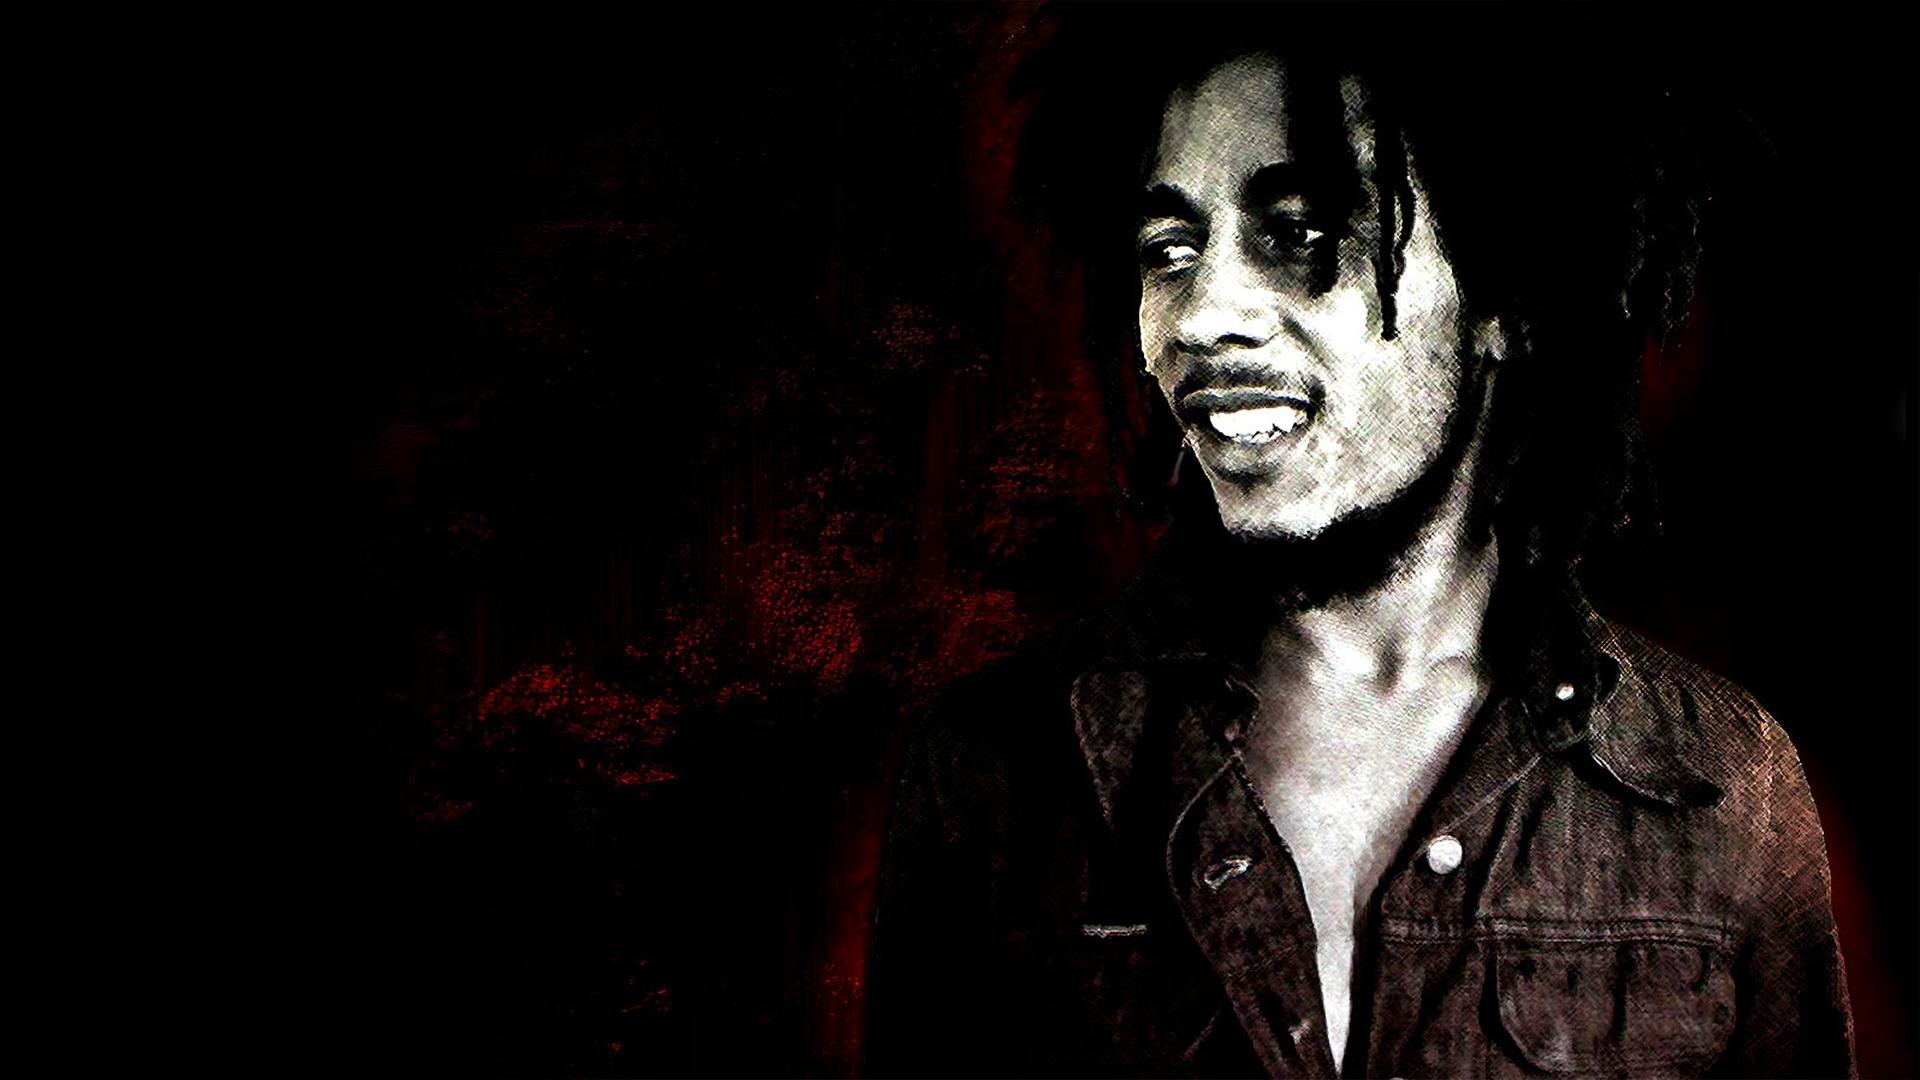 Wallpaper Bob Marley Smile Dreadlocks Face Shirt 1920x1080